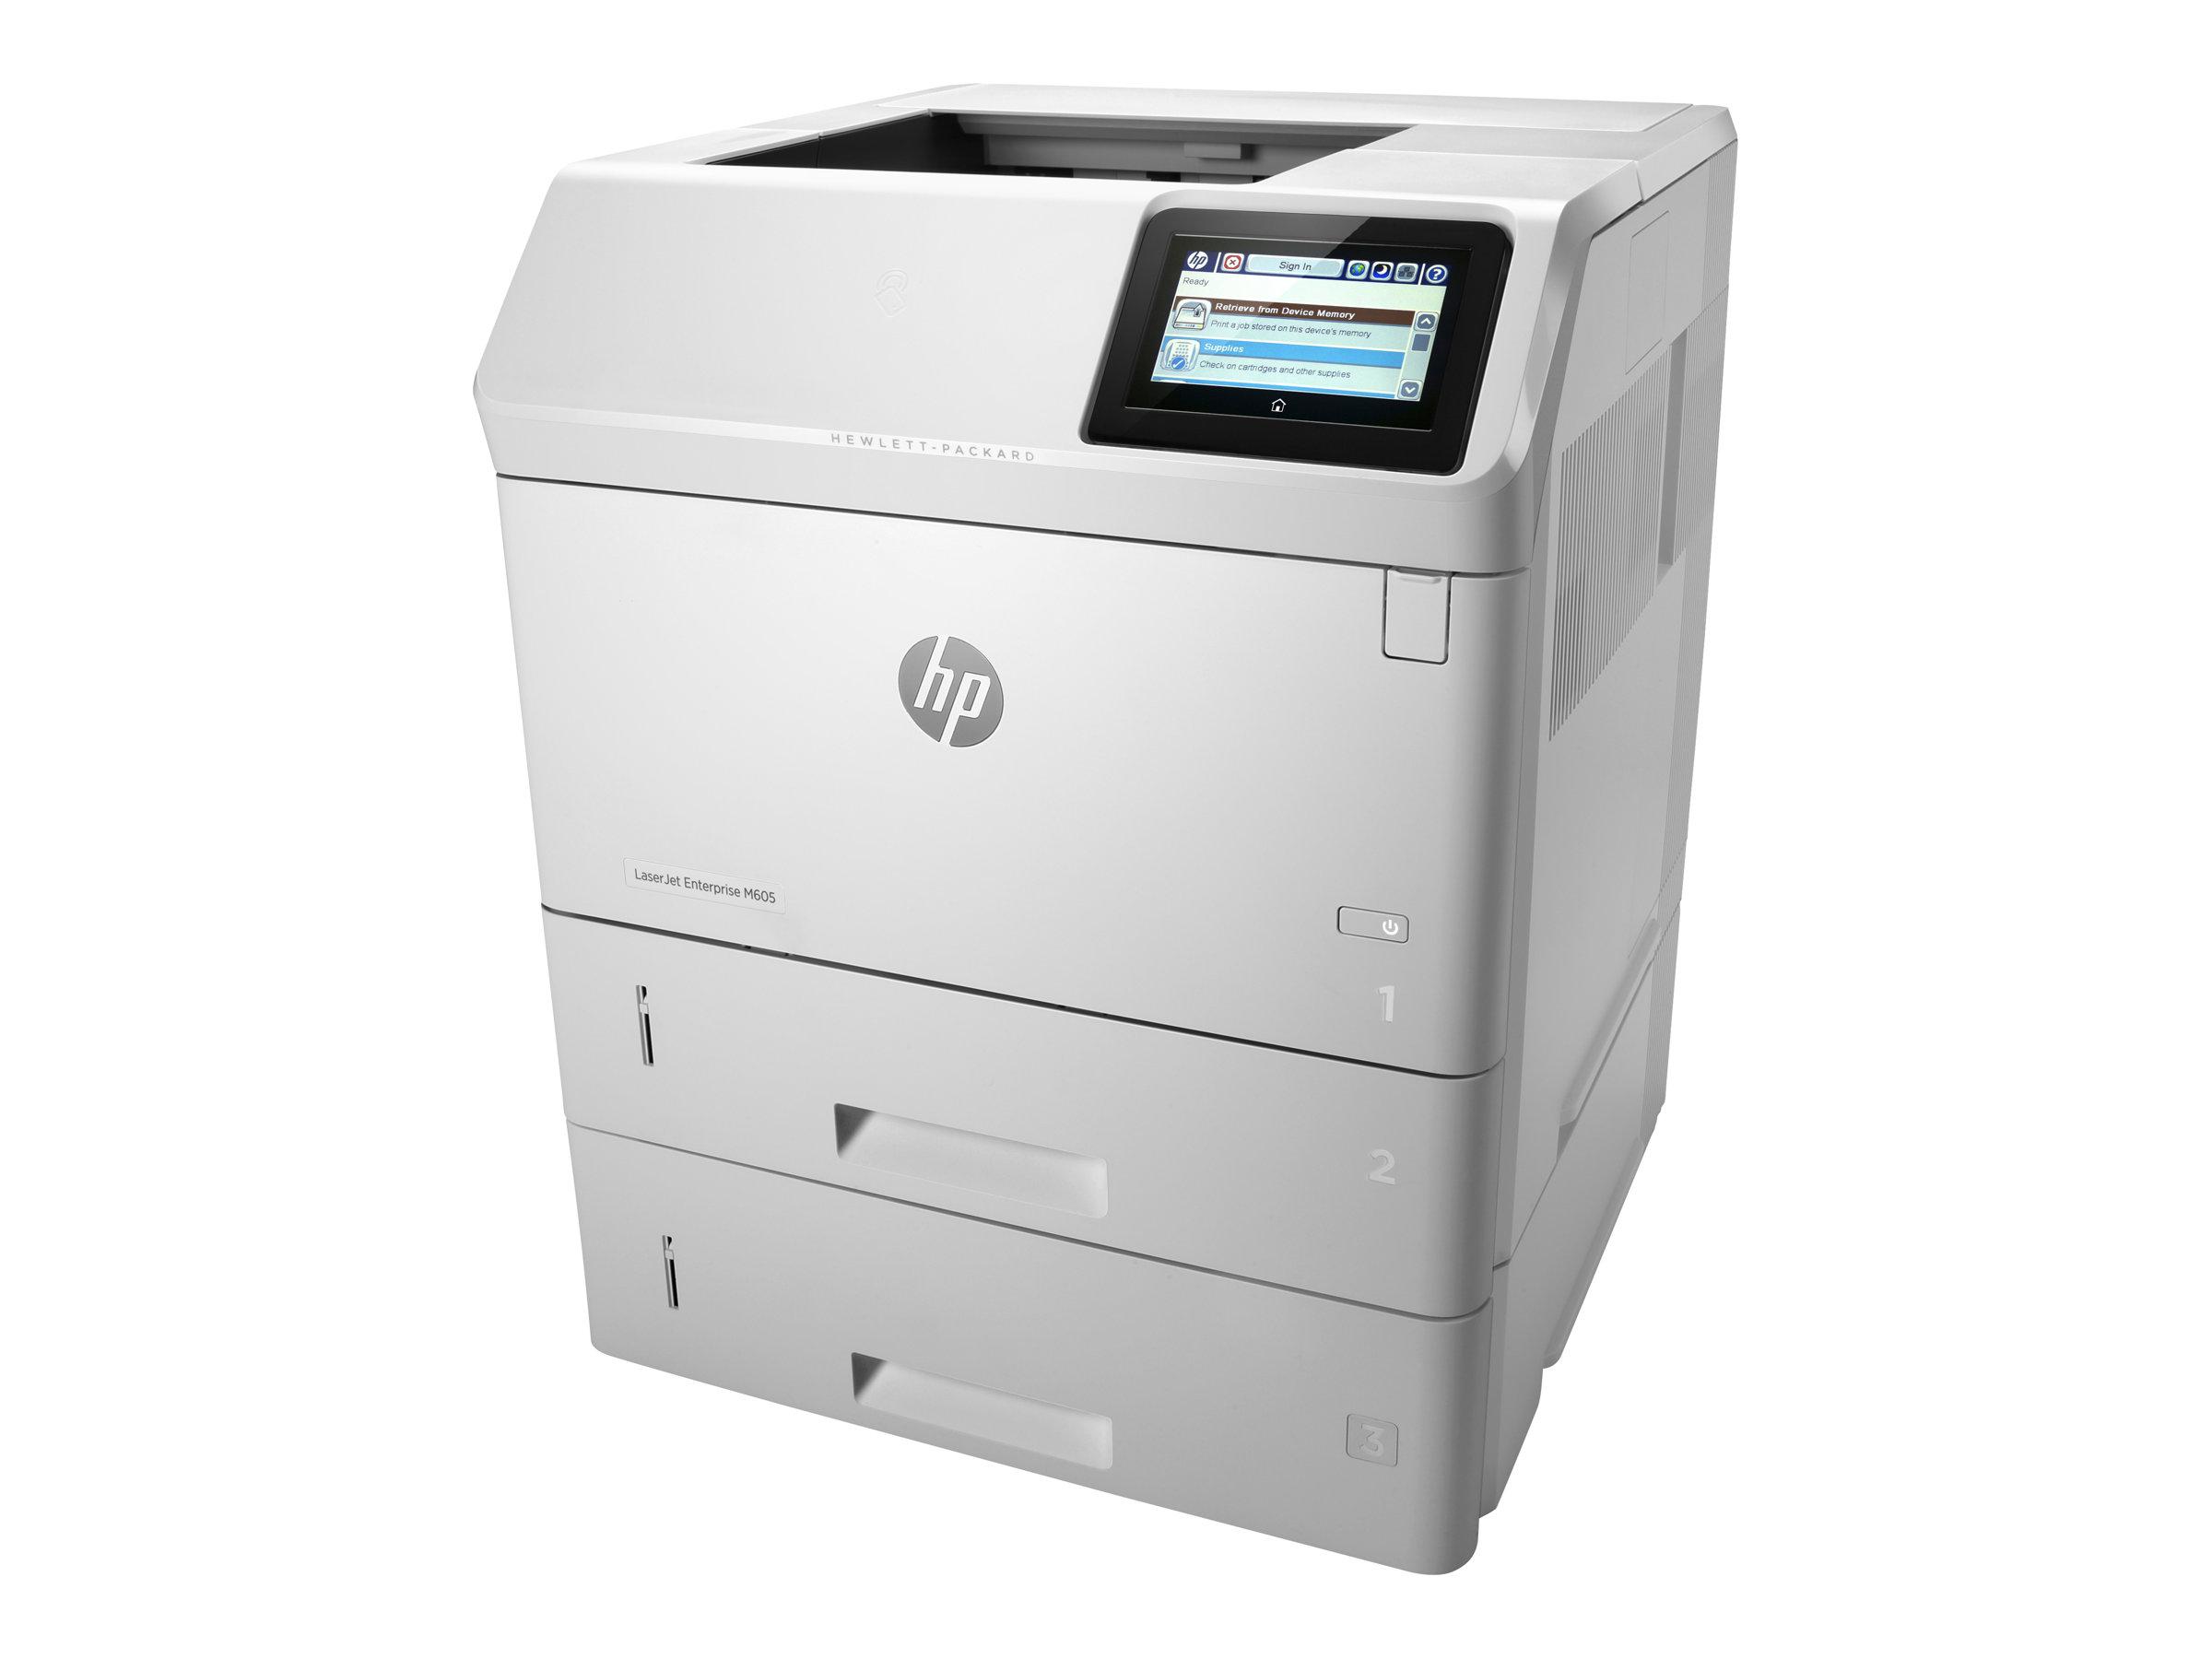 Vorschau: HP LaserJet Enterprise M605x - Drucker